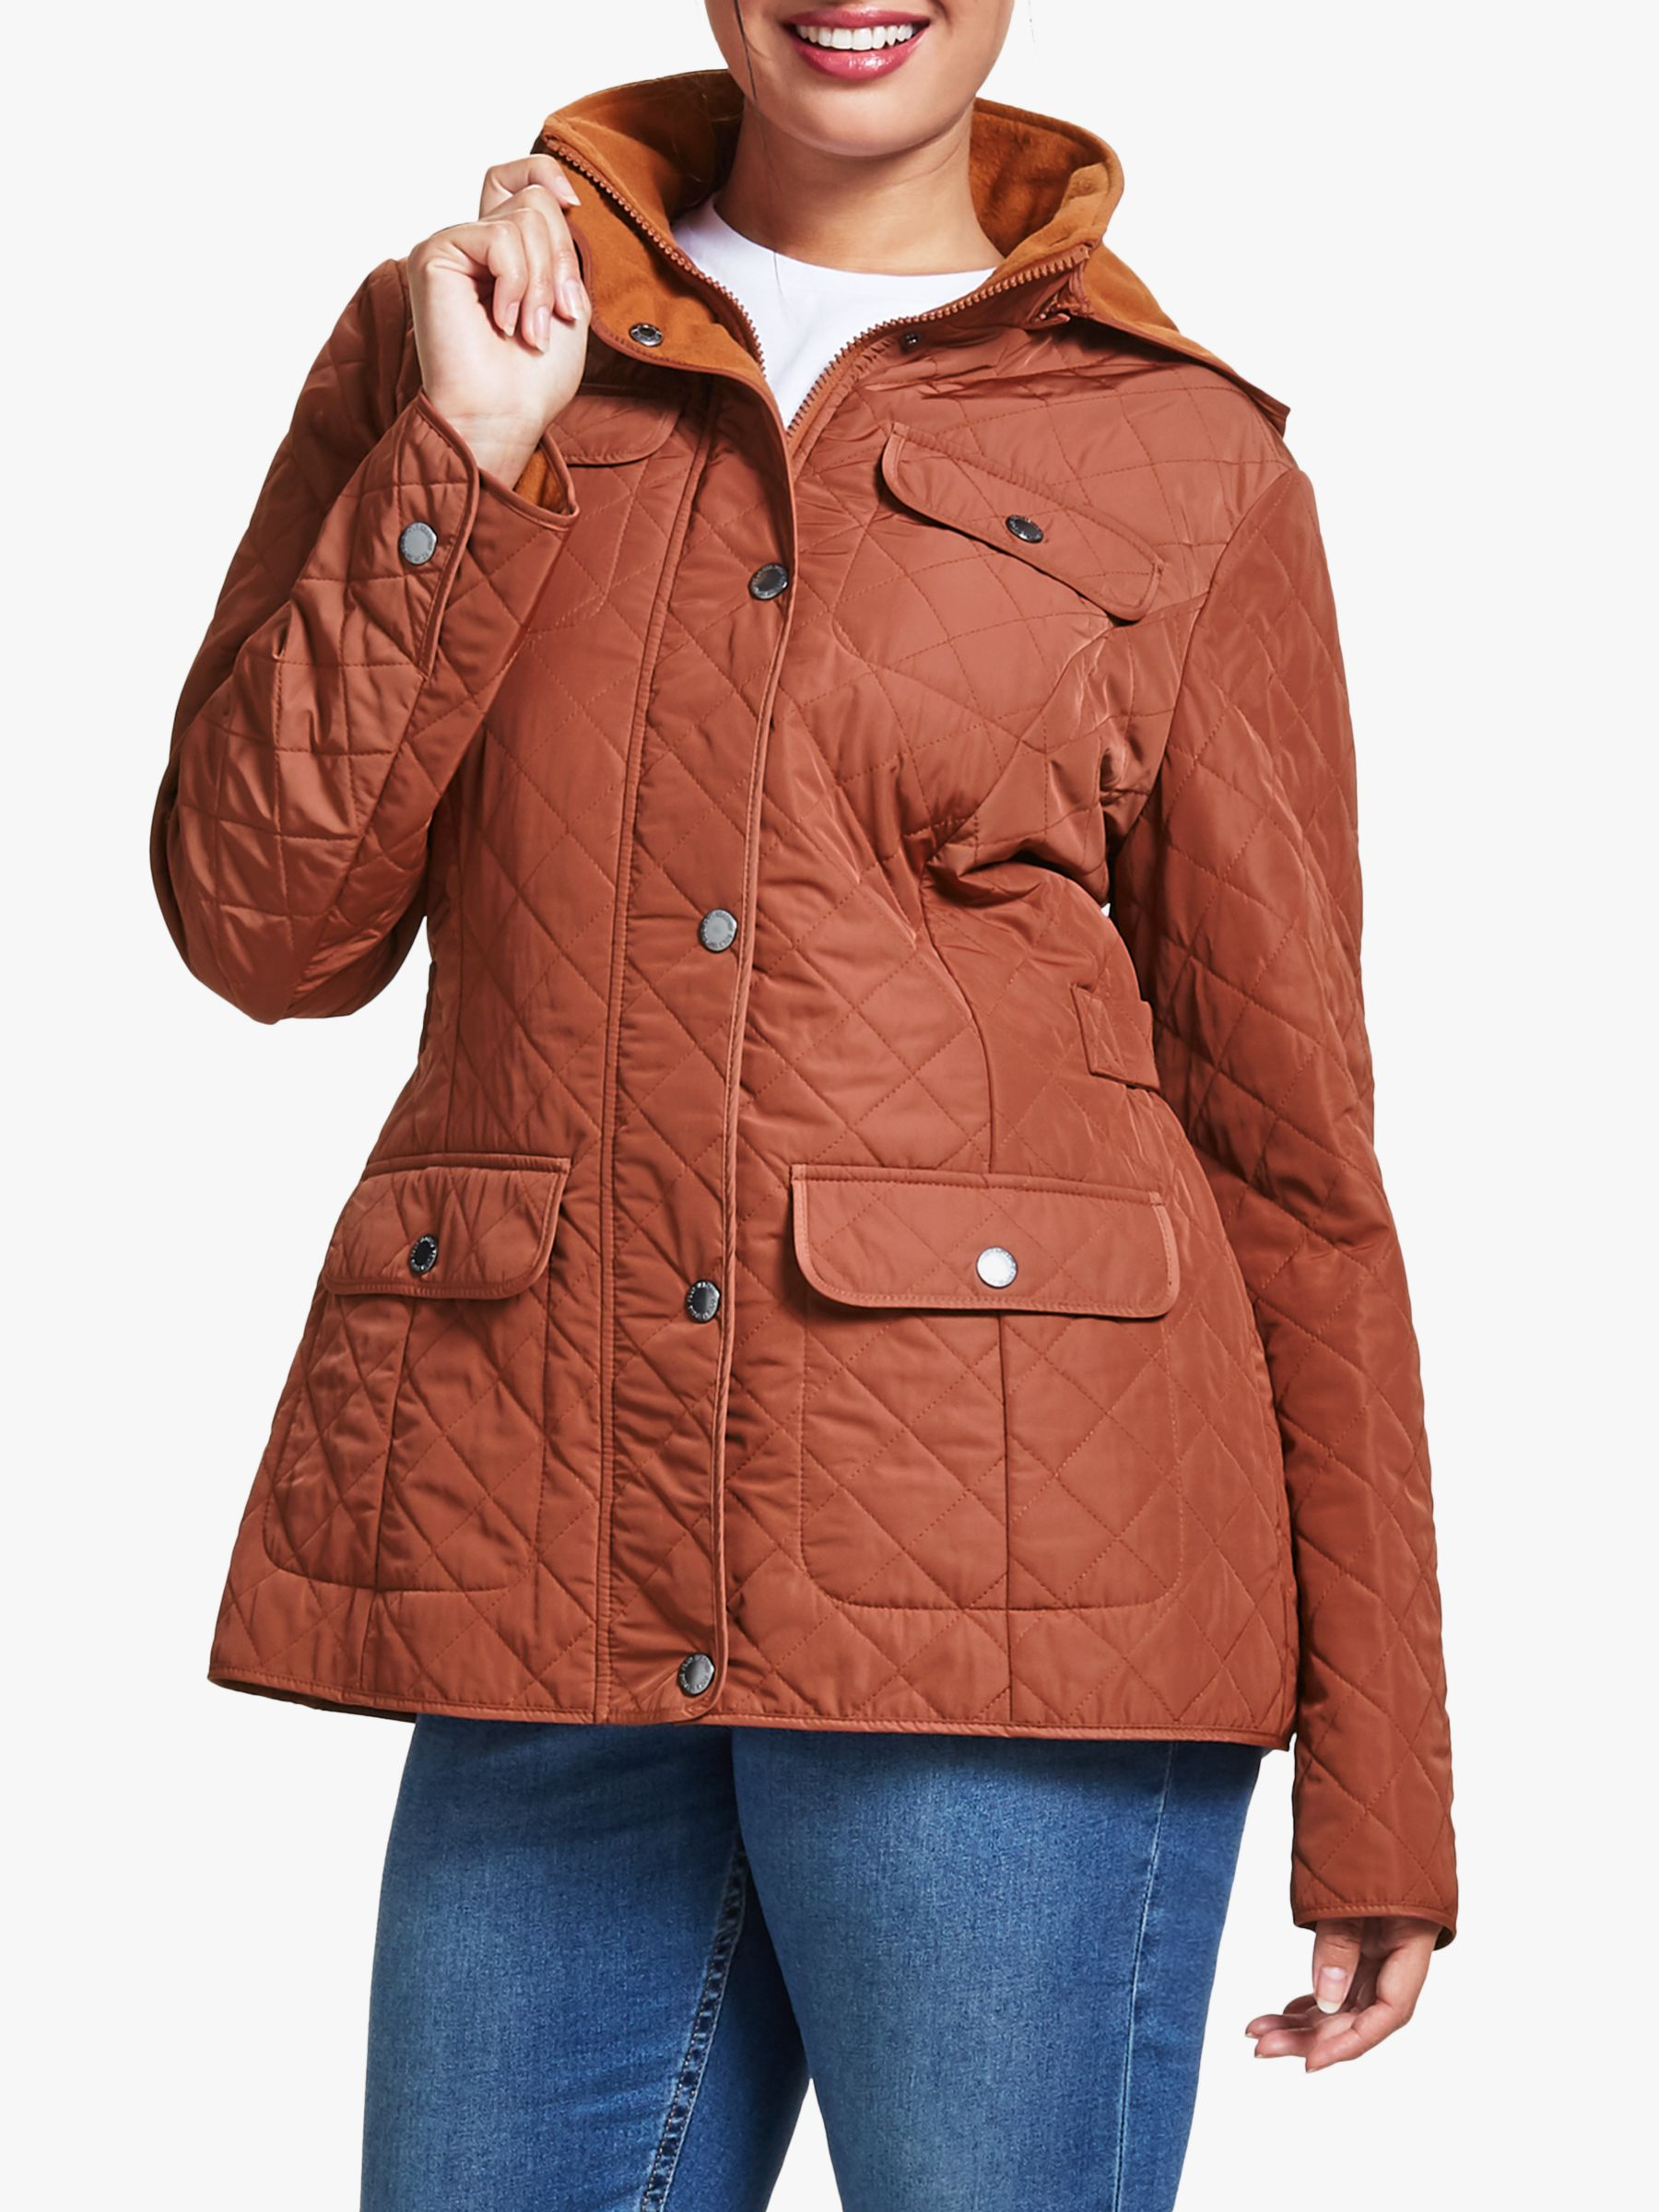 Four Seasons Four Seasons Polar Quilted Fleece Jacket